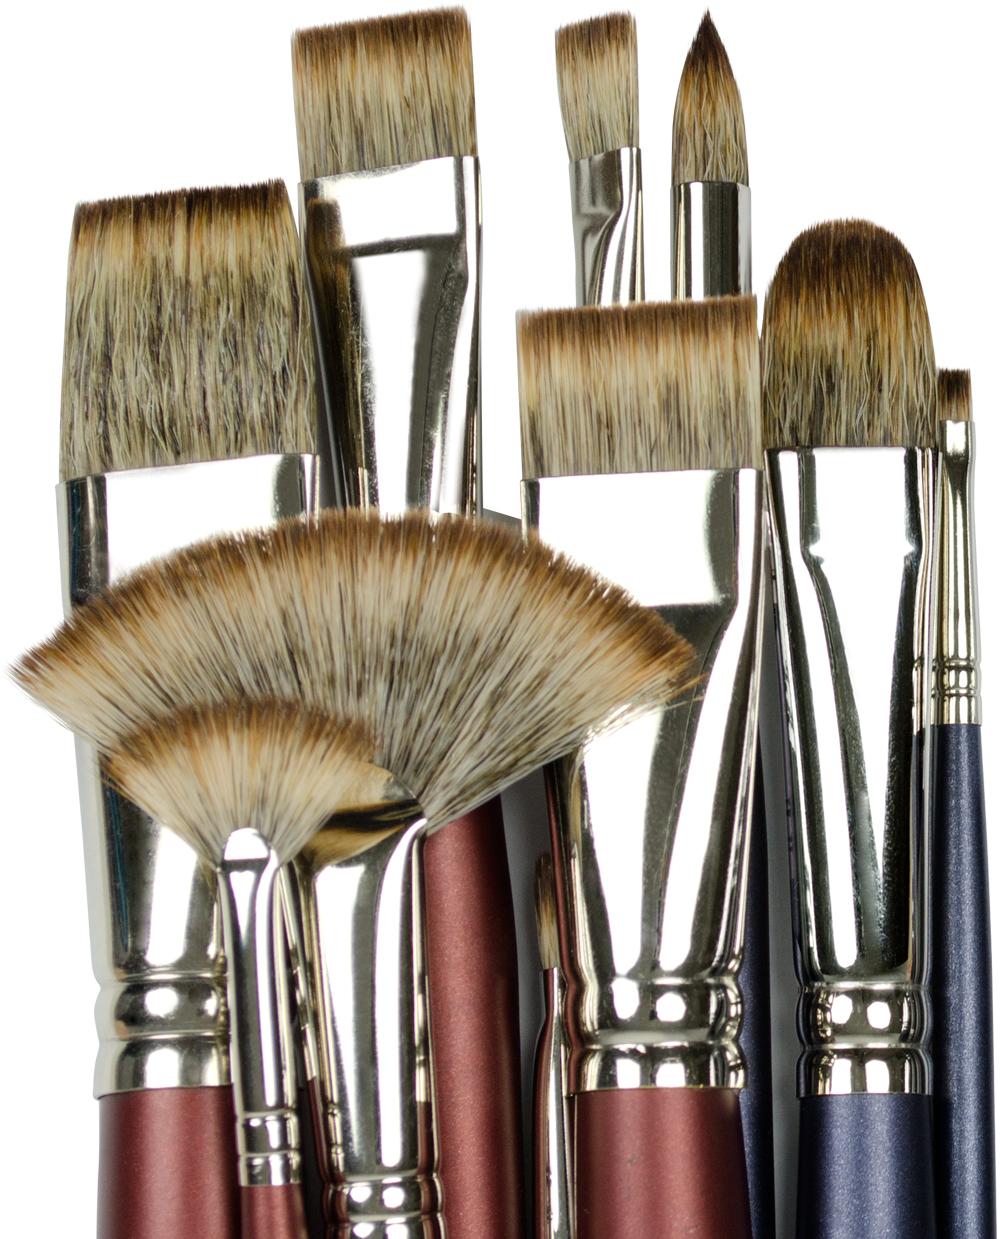 Royal /& Langnickel Paint Brush Detail Sable by Royal /& Langnickel